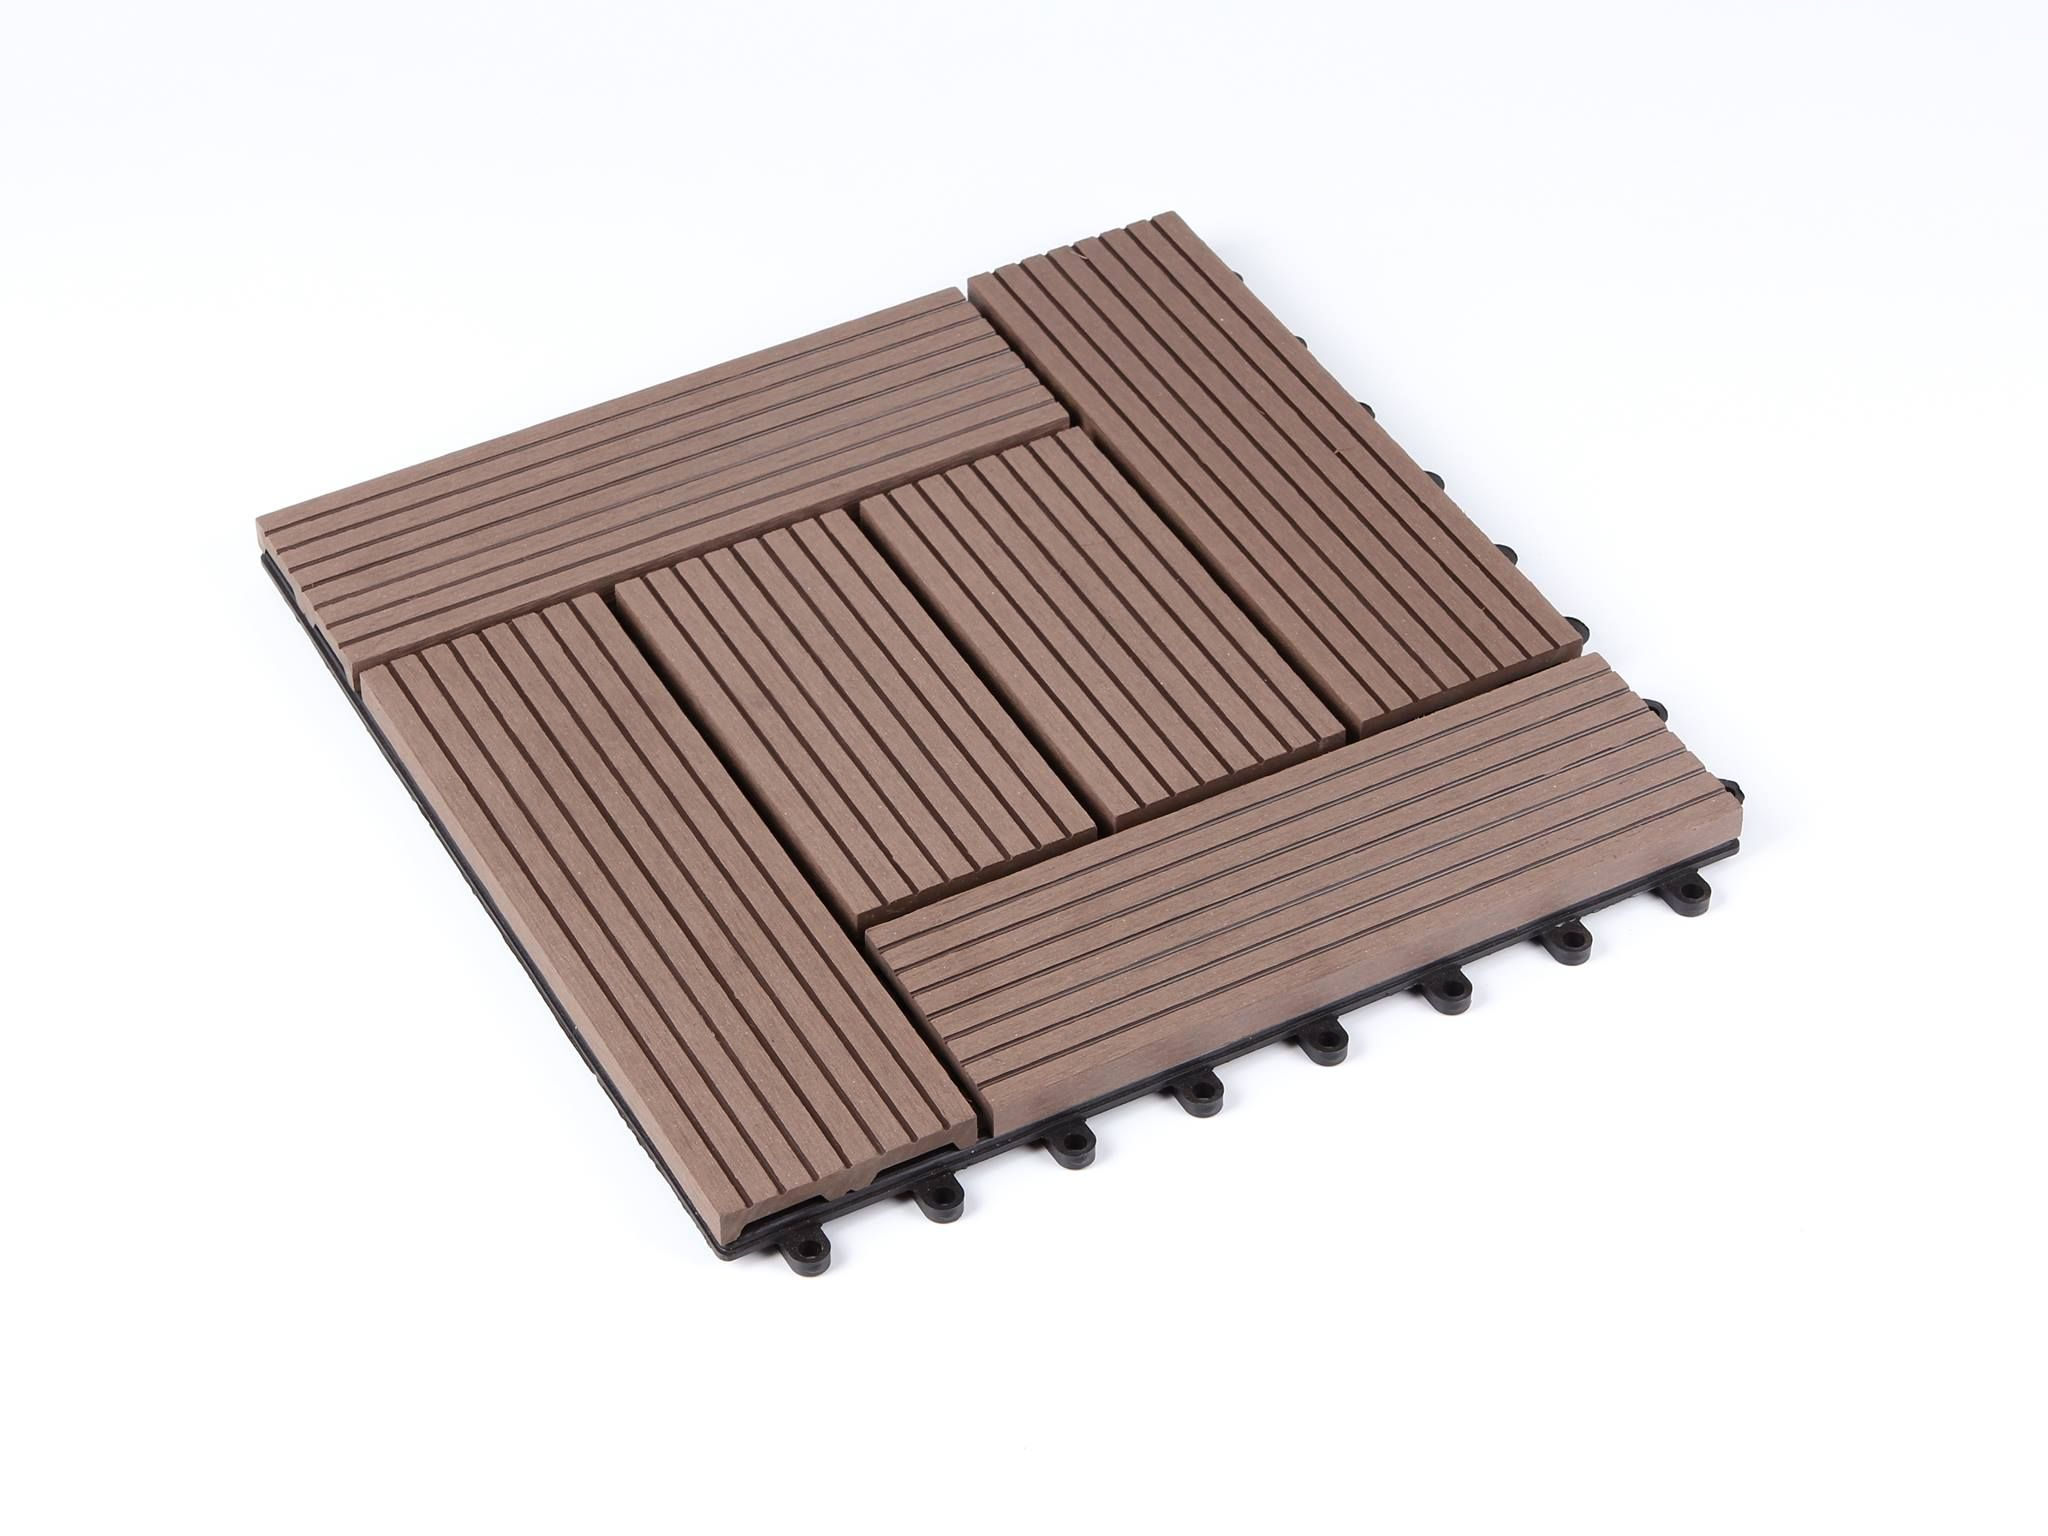 Coffee Deck tiles, Composite decking, Menards